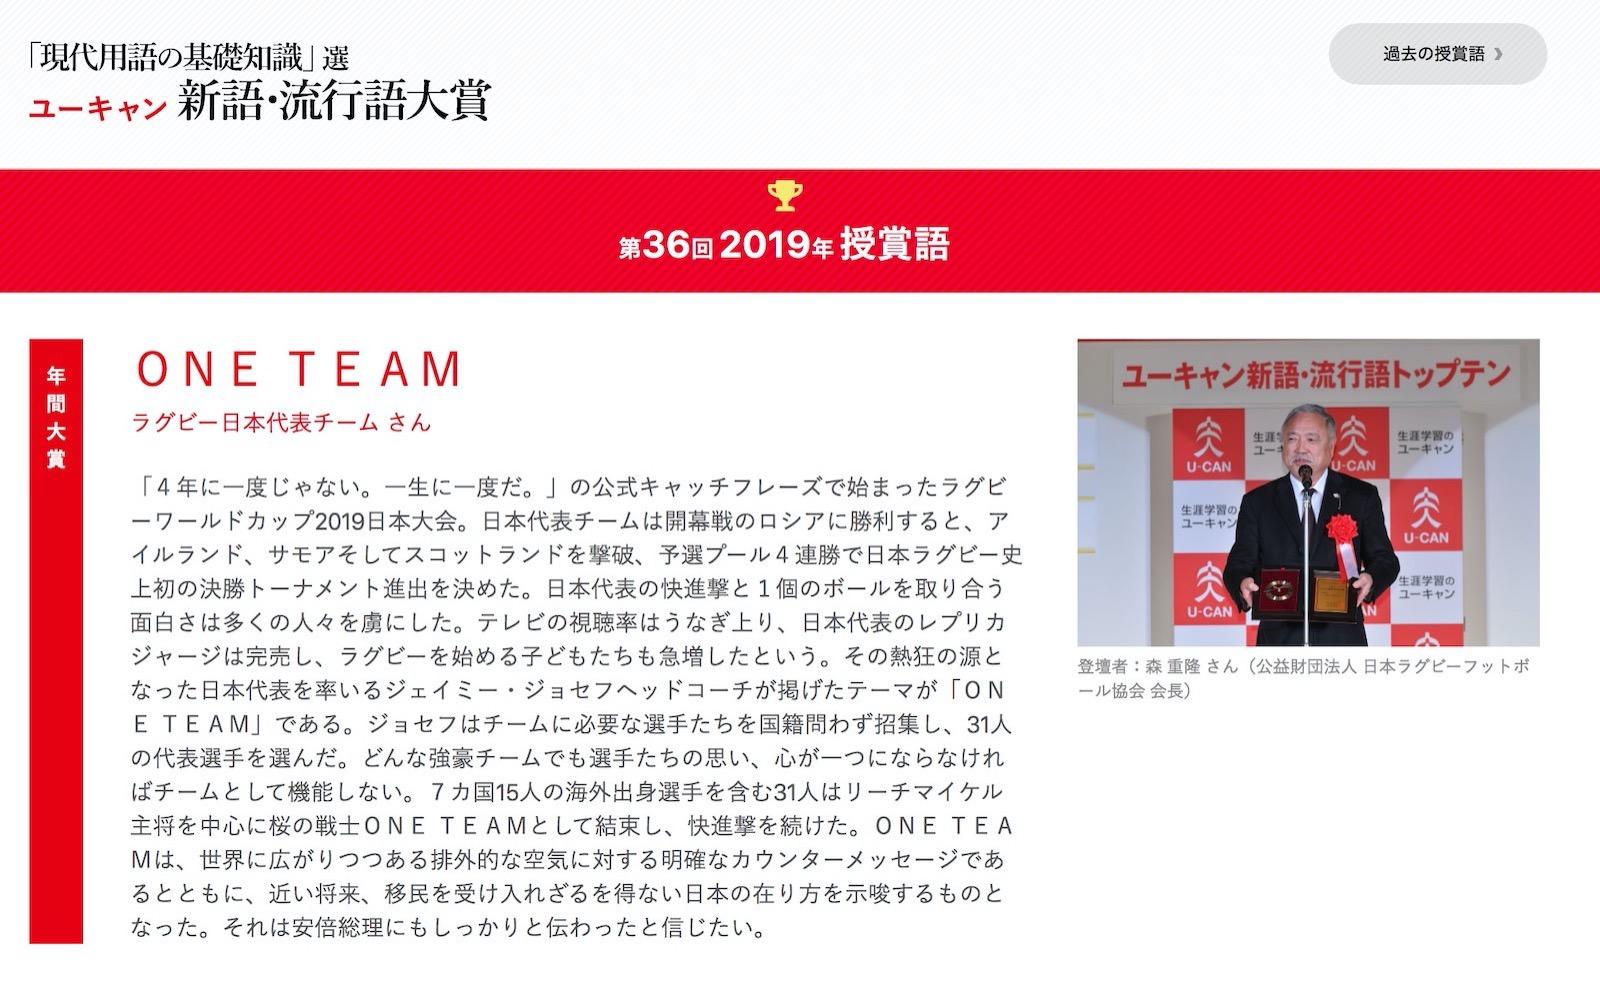 ryukogo-2019-one-team.jpg